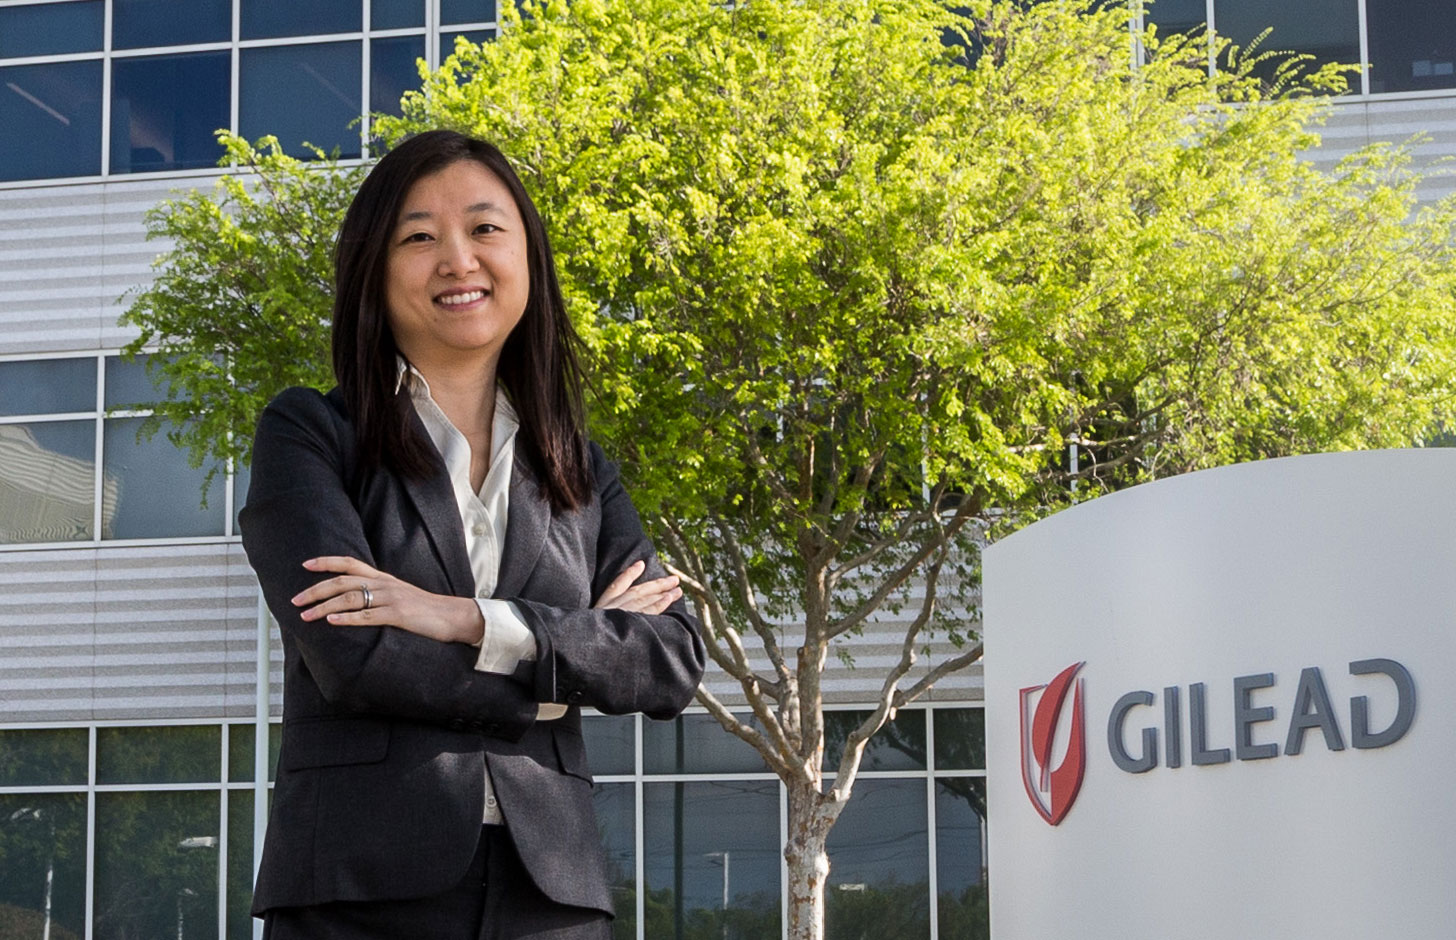 Berkeley-Haas evening and weekend MBA student Alicea Wu